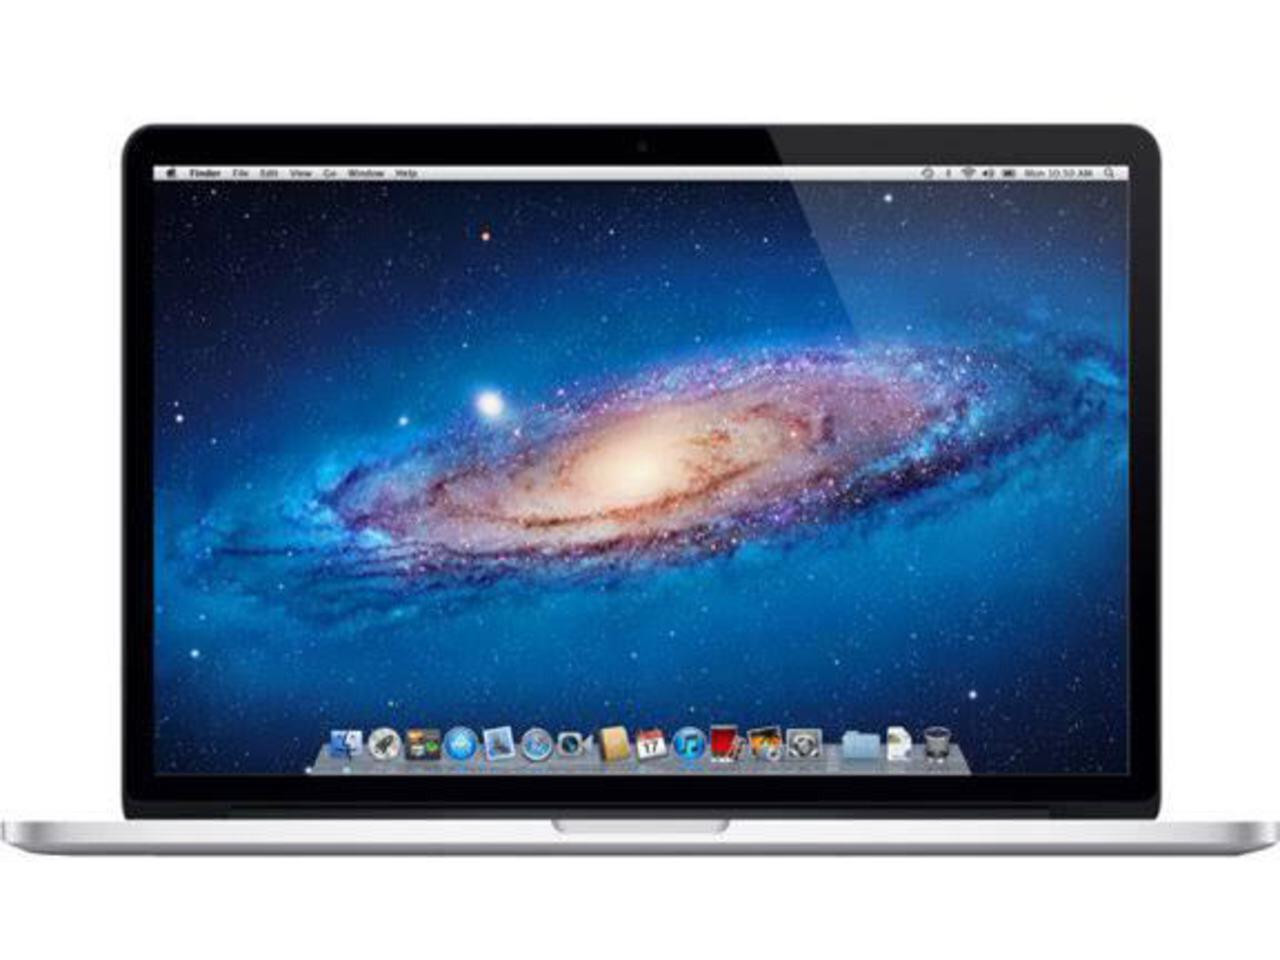 macbook pro 15 inch 2012 silver